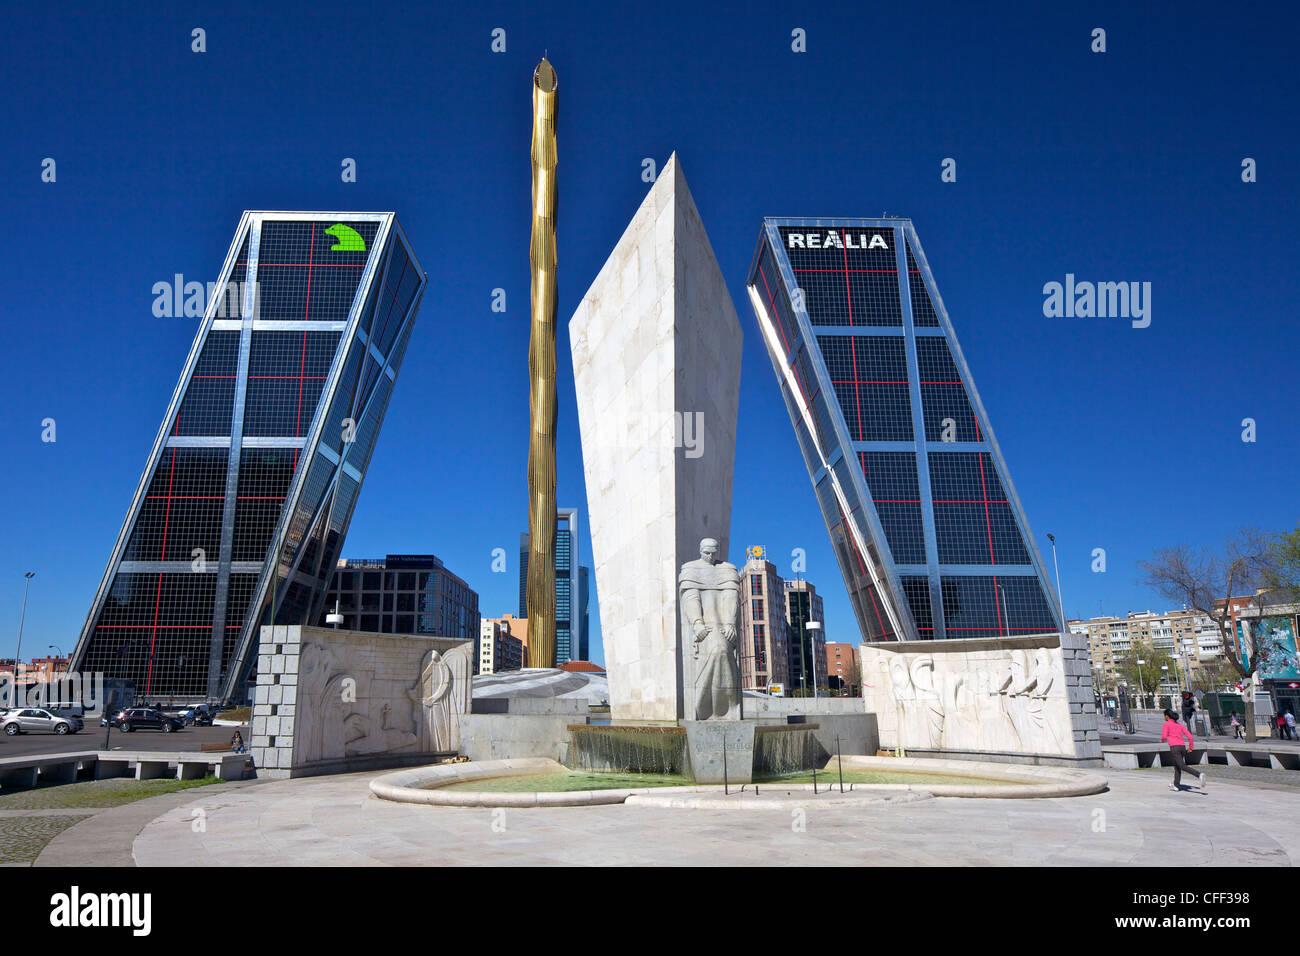 Kio towers (Torres Kio) at the end of the Paseo de la Castellana, Plaza Castilla, Madrid, Spain, Europe - Stock Image